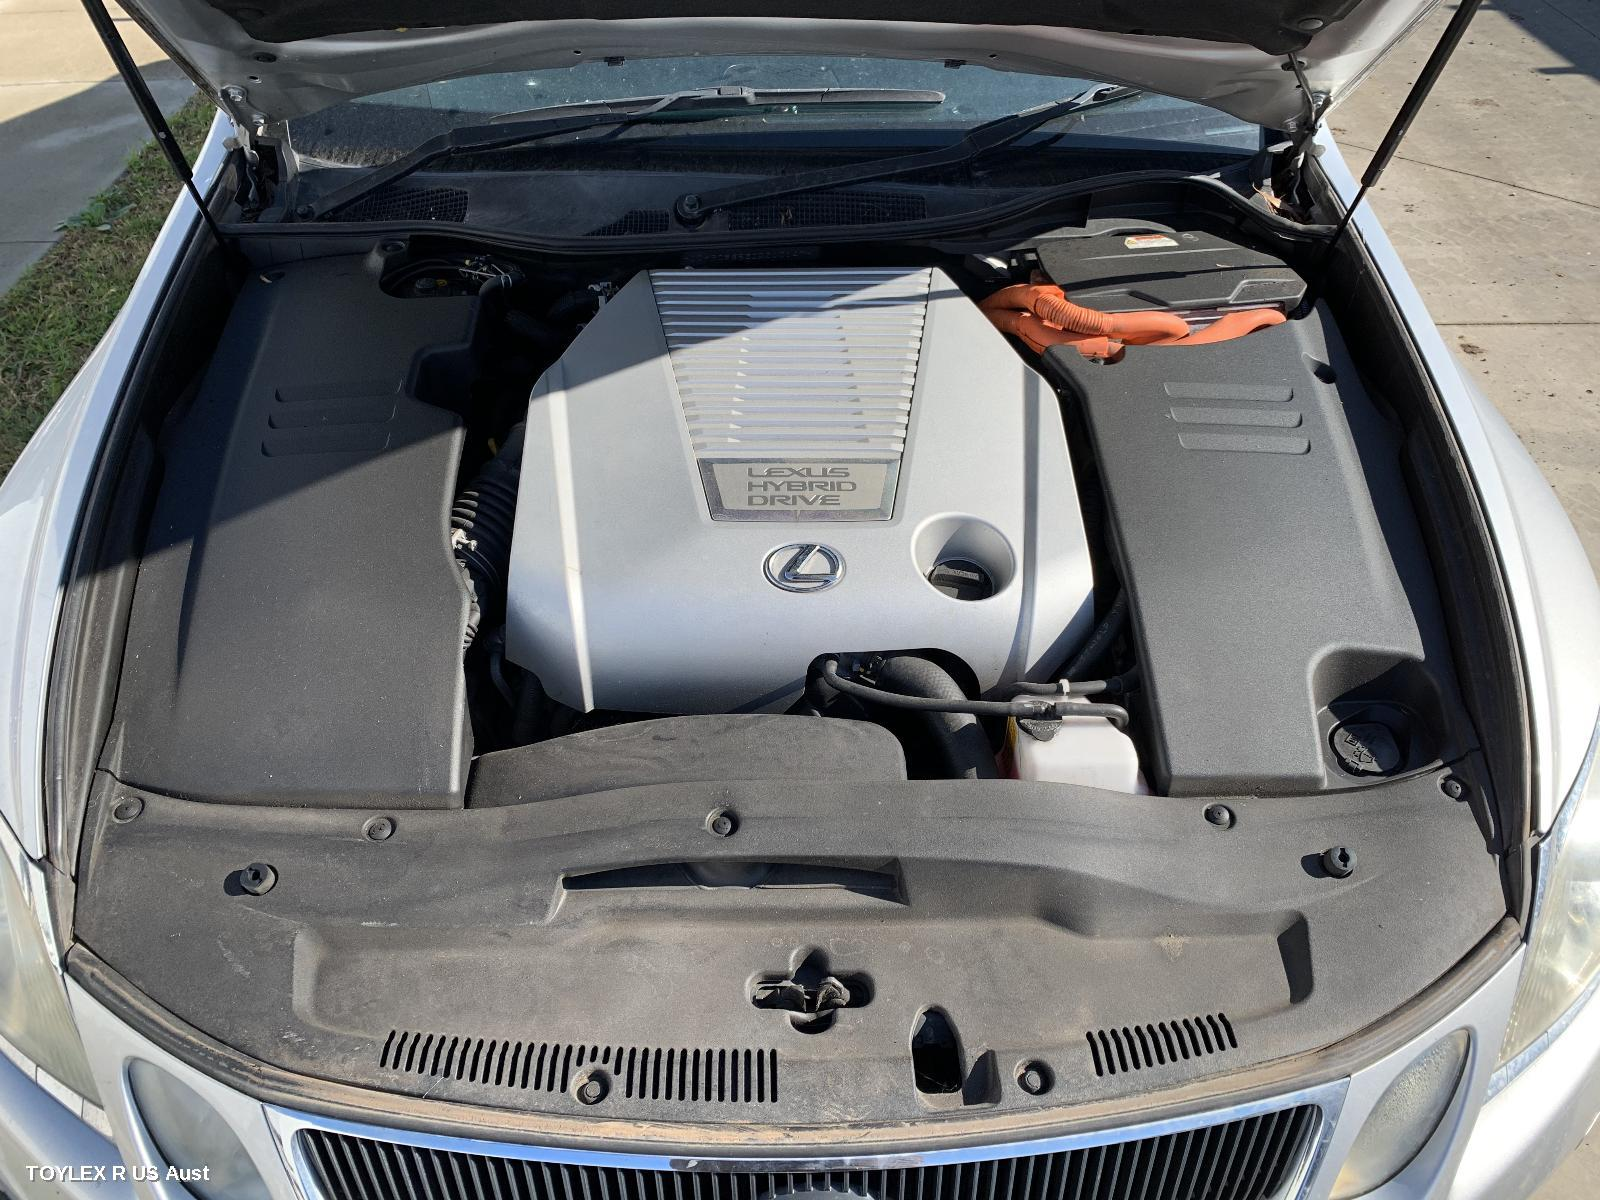 LEXUS GS, Engine, PETROL, 3.5, 2GR, HYBRID, 190 SERIES, 03/05-12/11